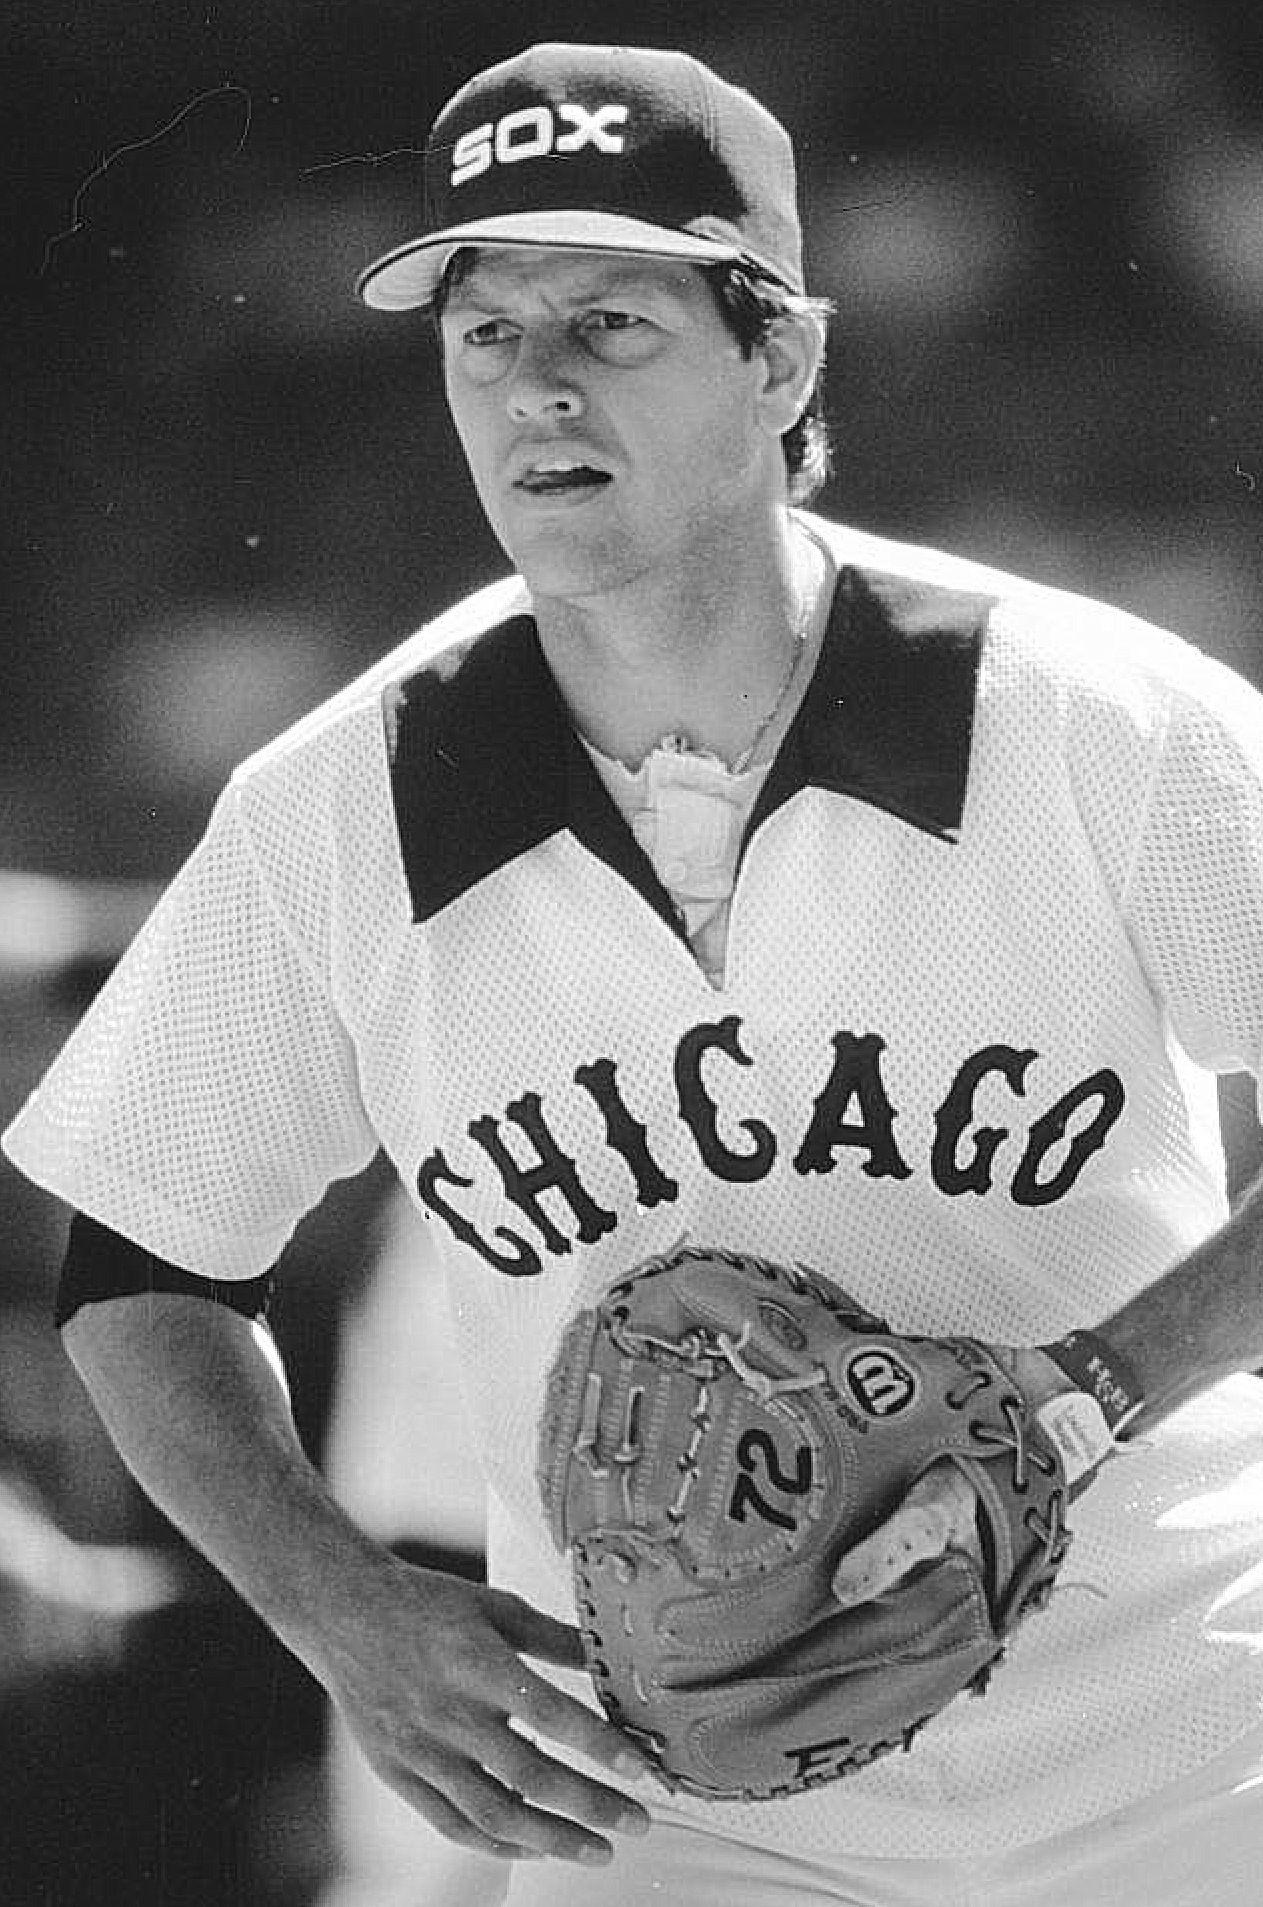 Carlton Fisk 1983: Chicago White Sox: Carlton Fisk... They Don't Make